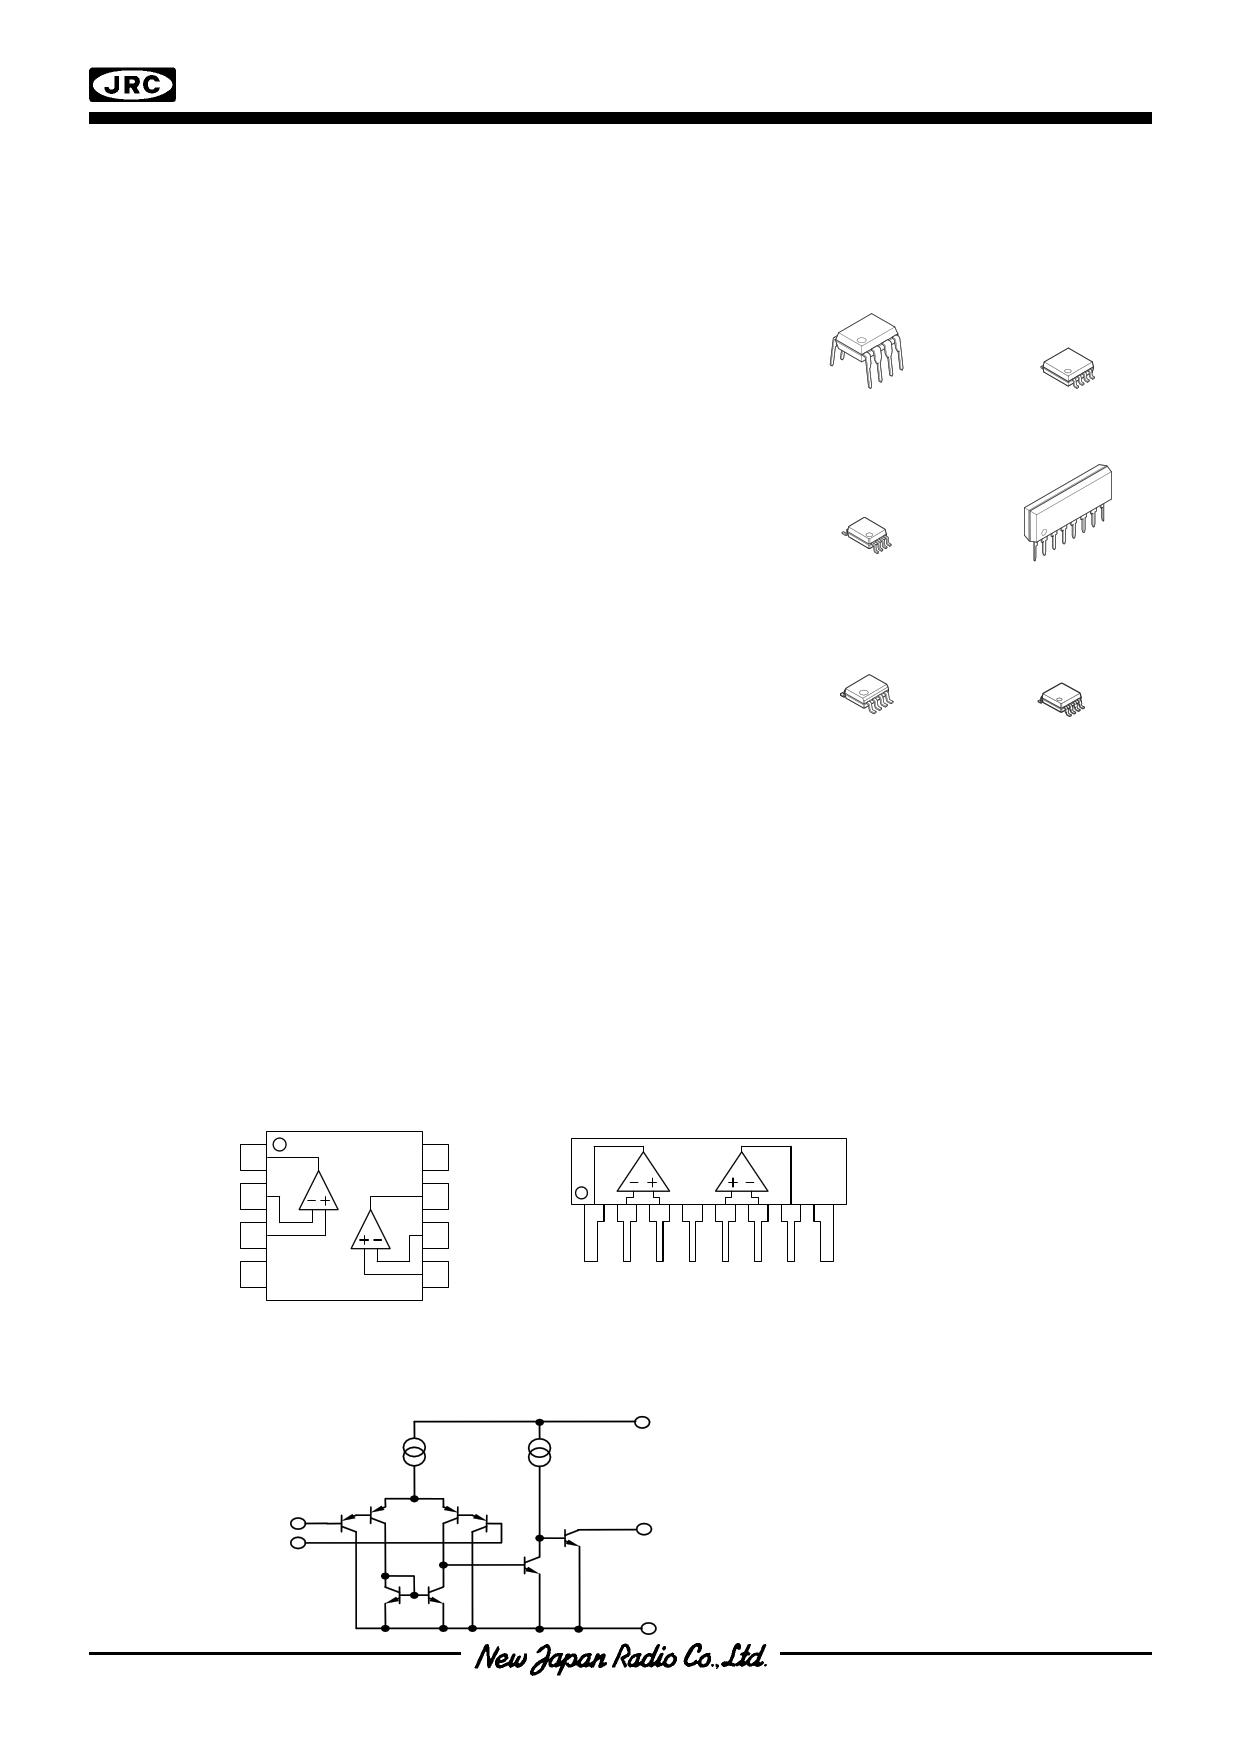 njm2903 pdf  ub370 uc774 ud130 uc2dc ud2b8 - single-supply dual comparator